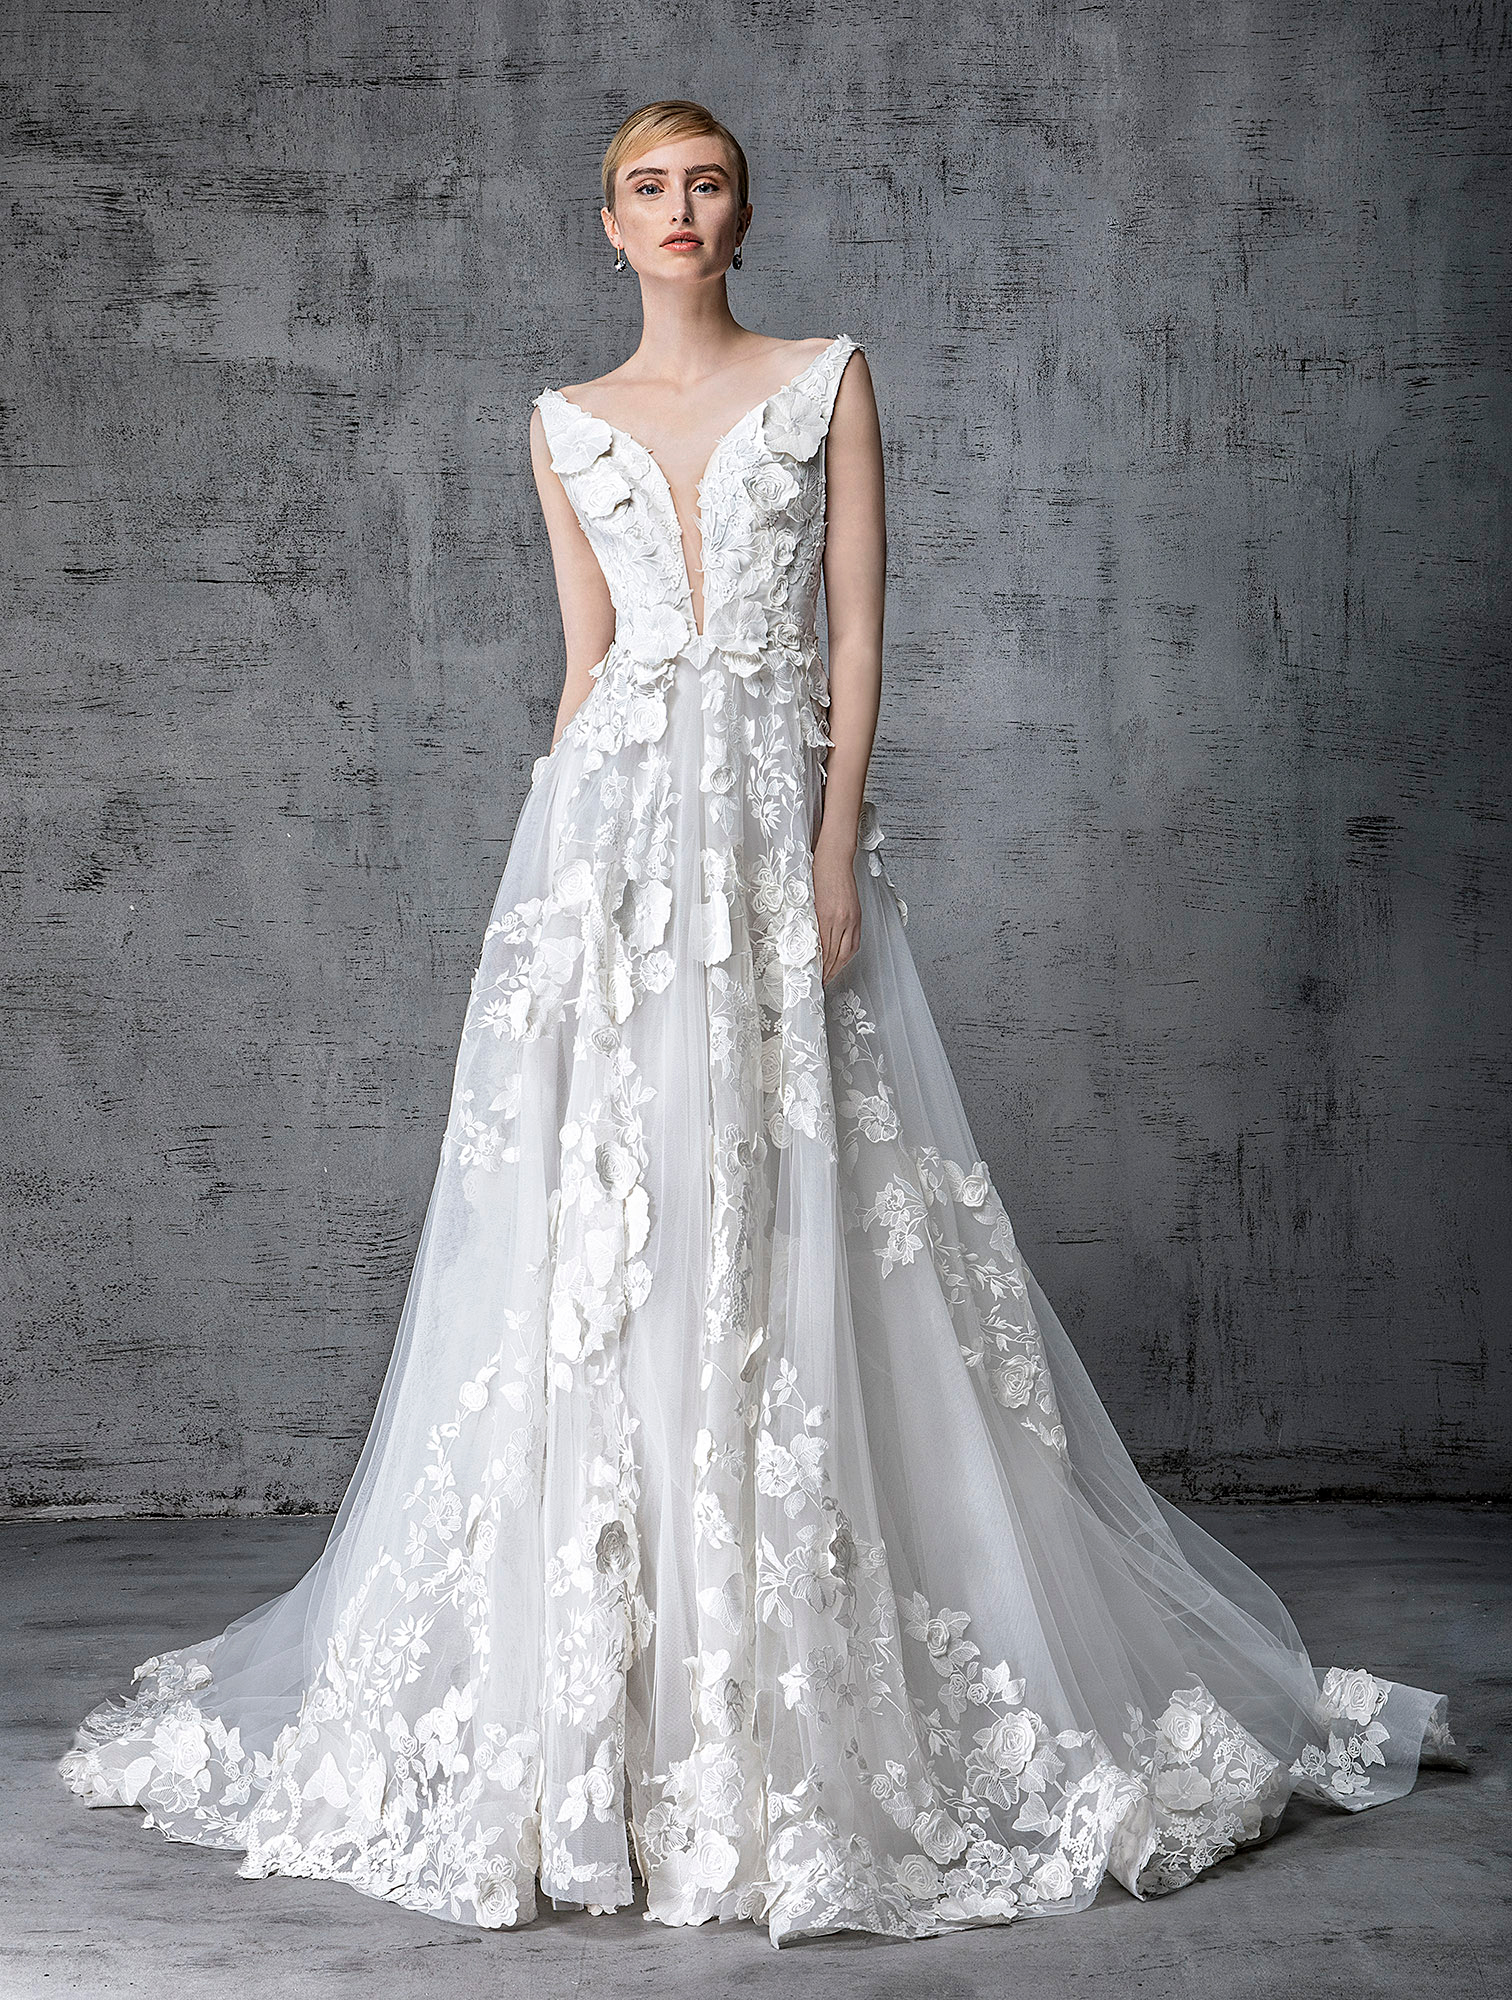 victoria kyriakides wedding dress spring 2019 plunging neck floral appliques